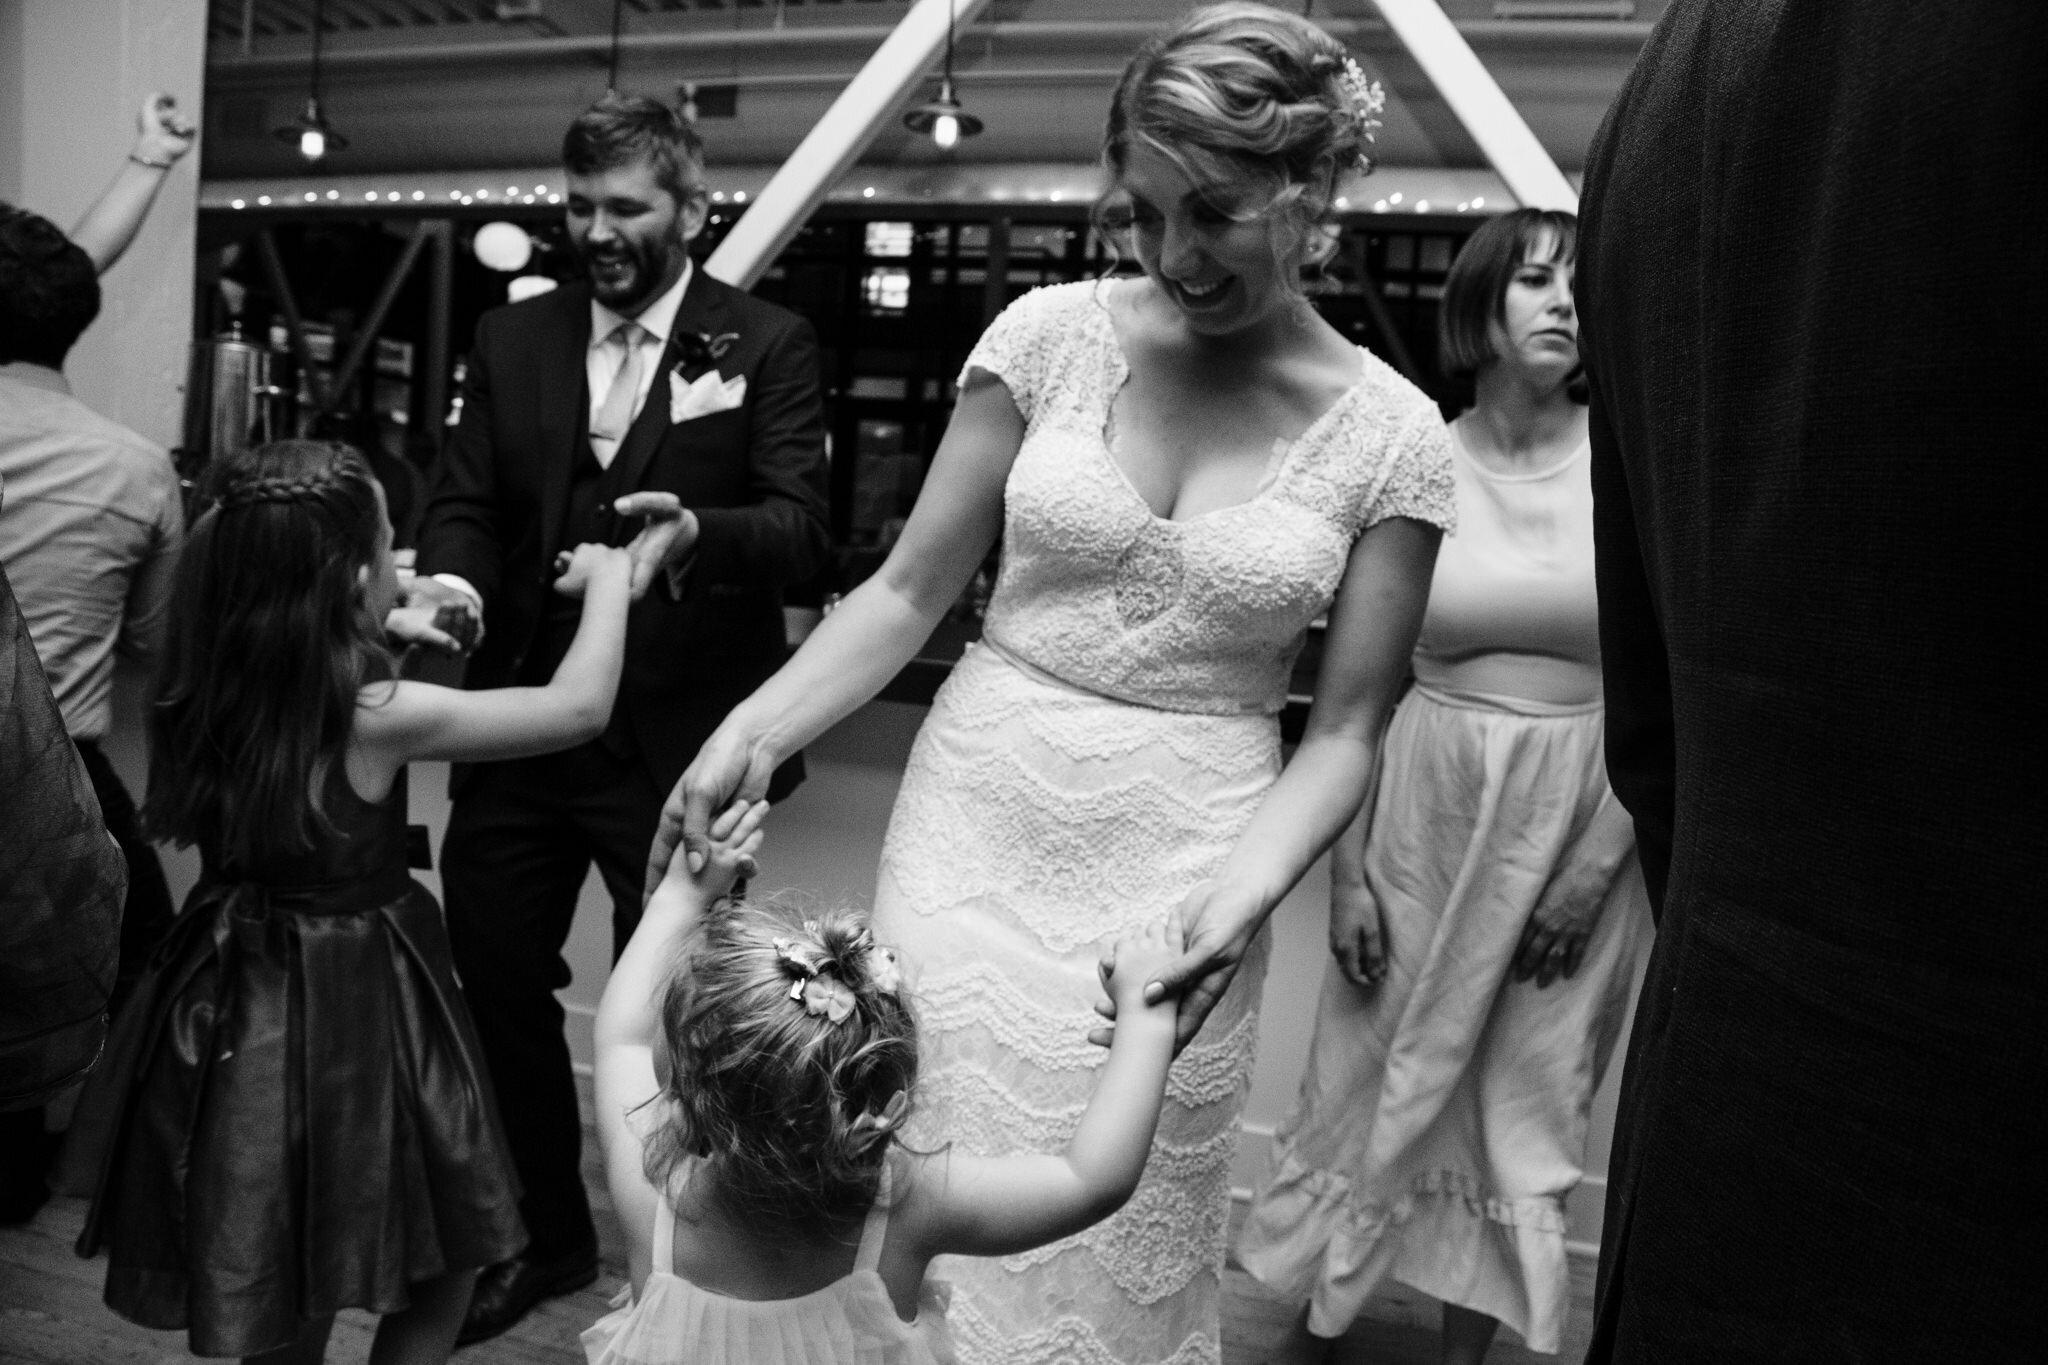 chicago-greenhouse-loft-wedding-dance-rebeccaylasotras-6.jpg